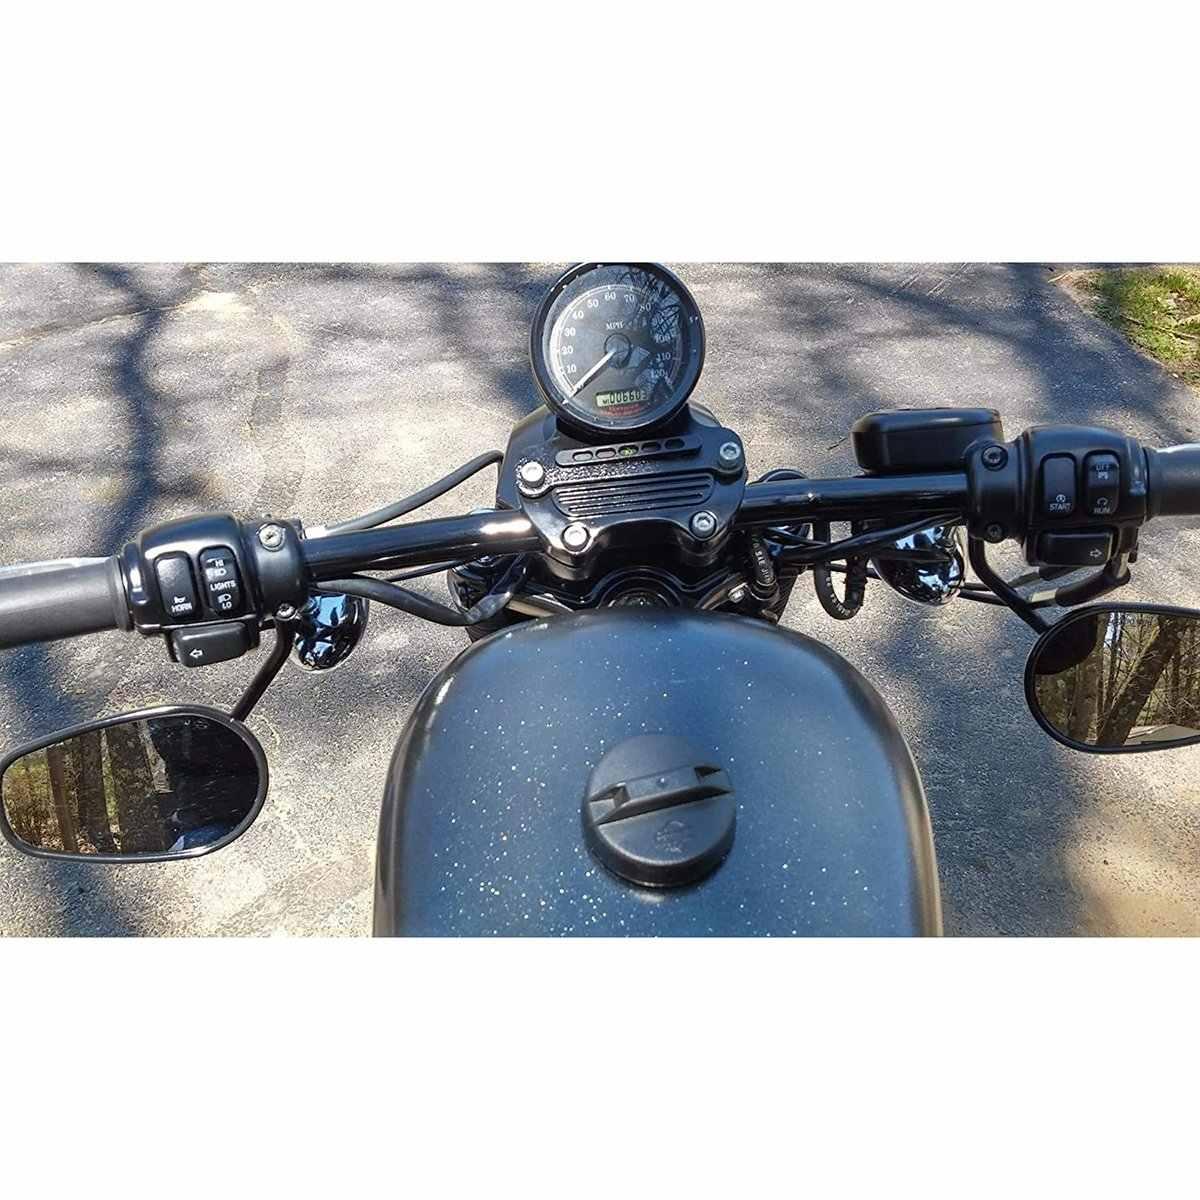 Manillar de motocicleta 7//8 22 mm Drag Barra recta para Honda Yamaha Kawasaki Suzuki BMW Chopper Bobber